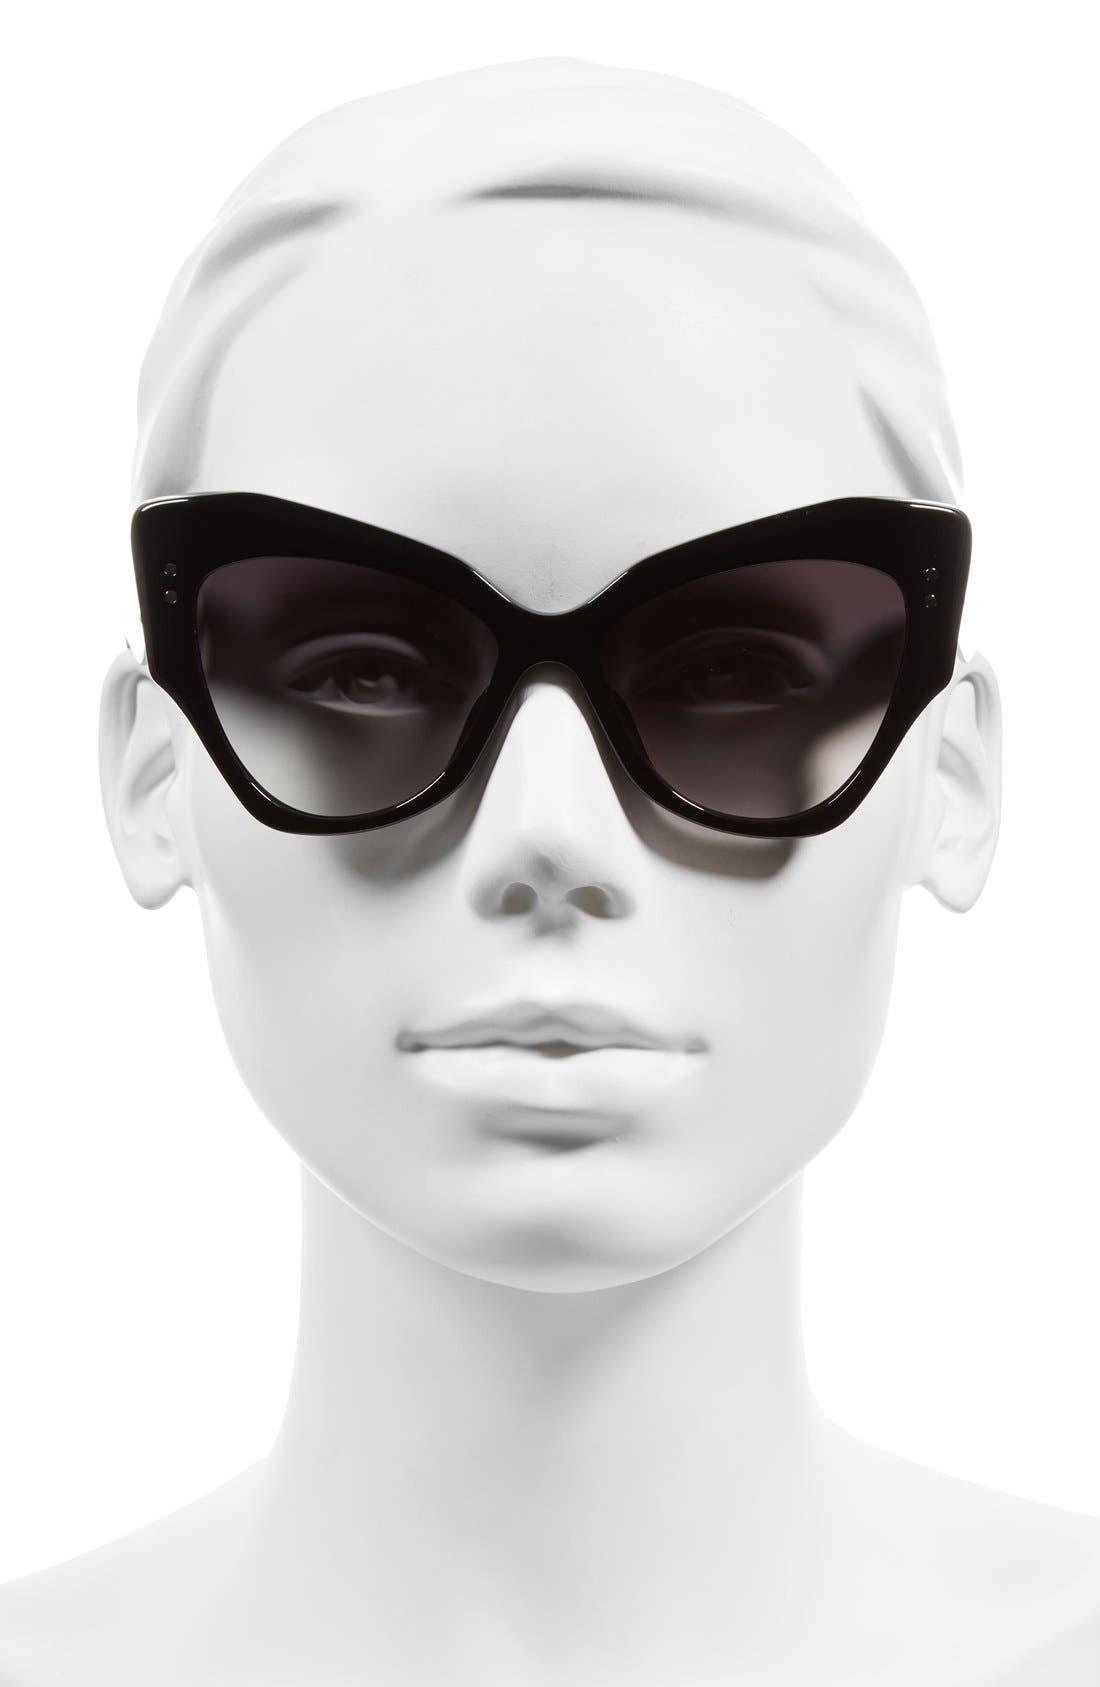 52mm Cat Eye Sunglasses,                             Alternate thumbnail 2, color,                             Black